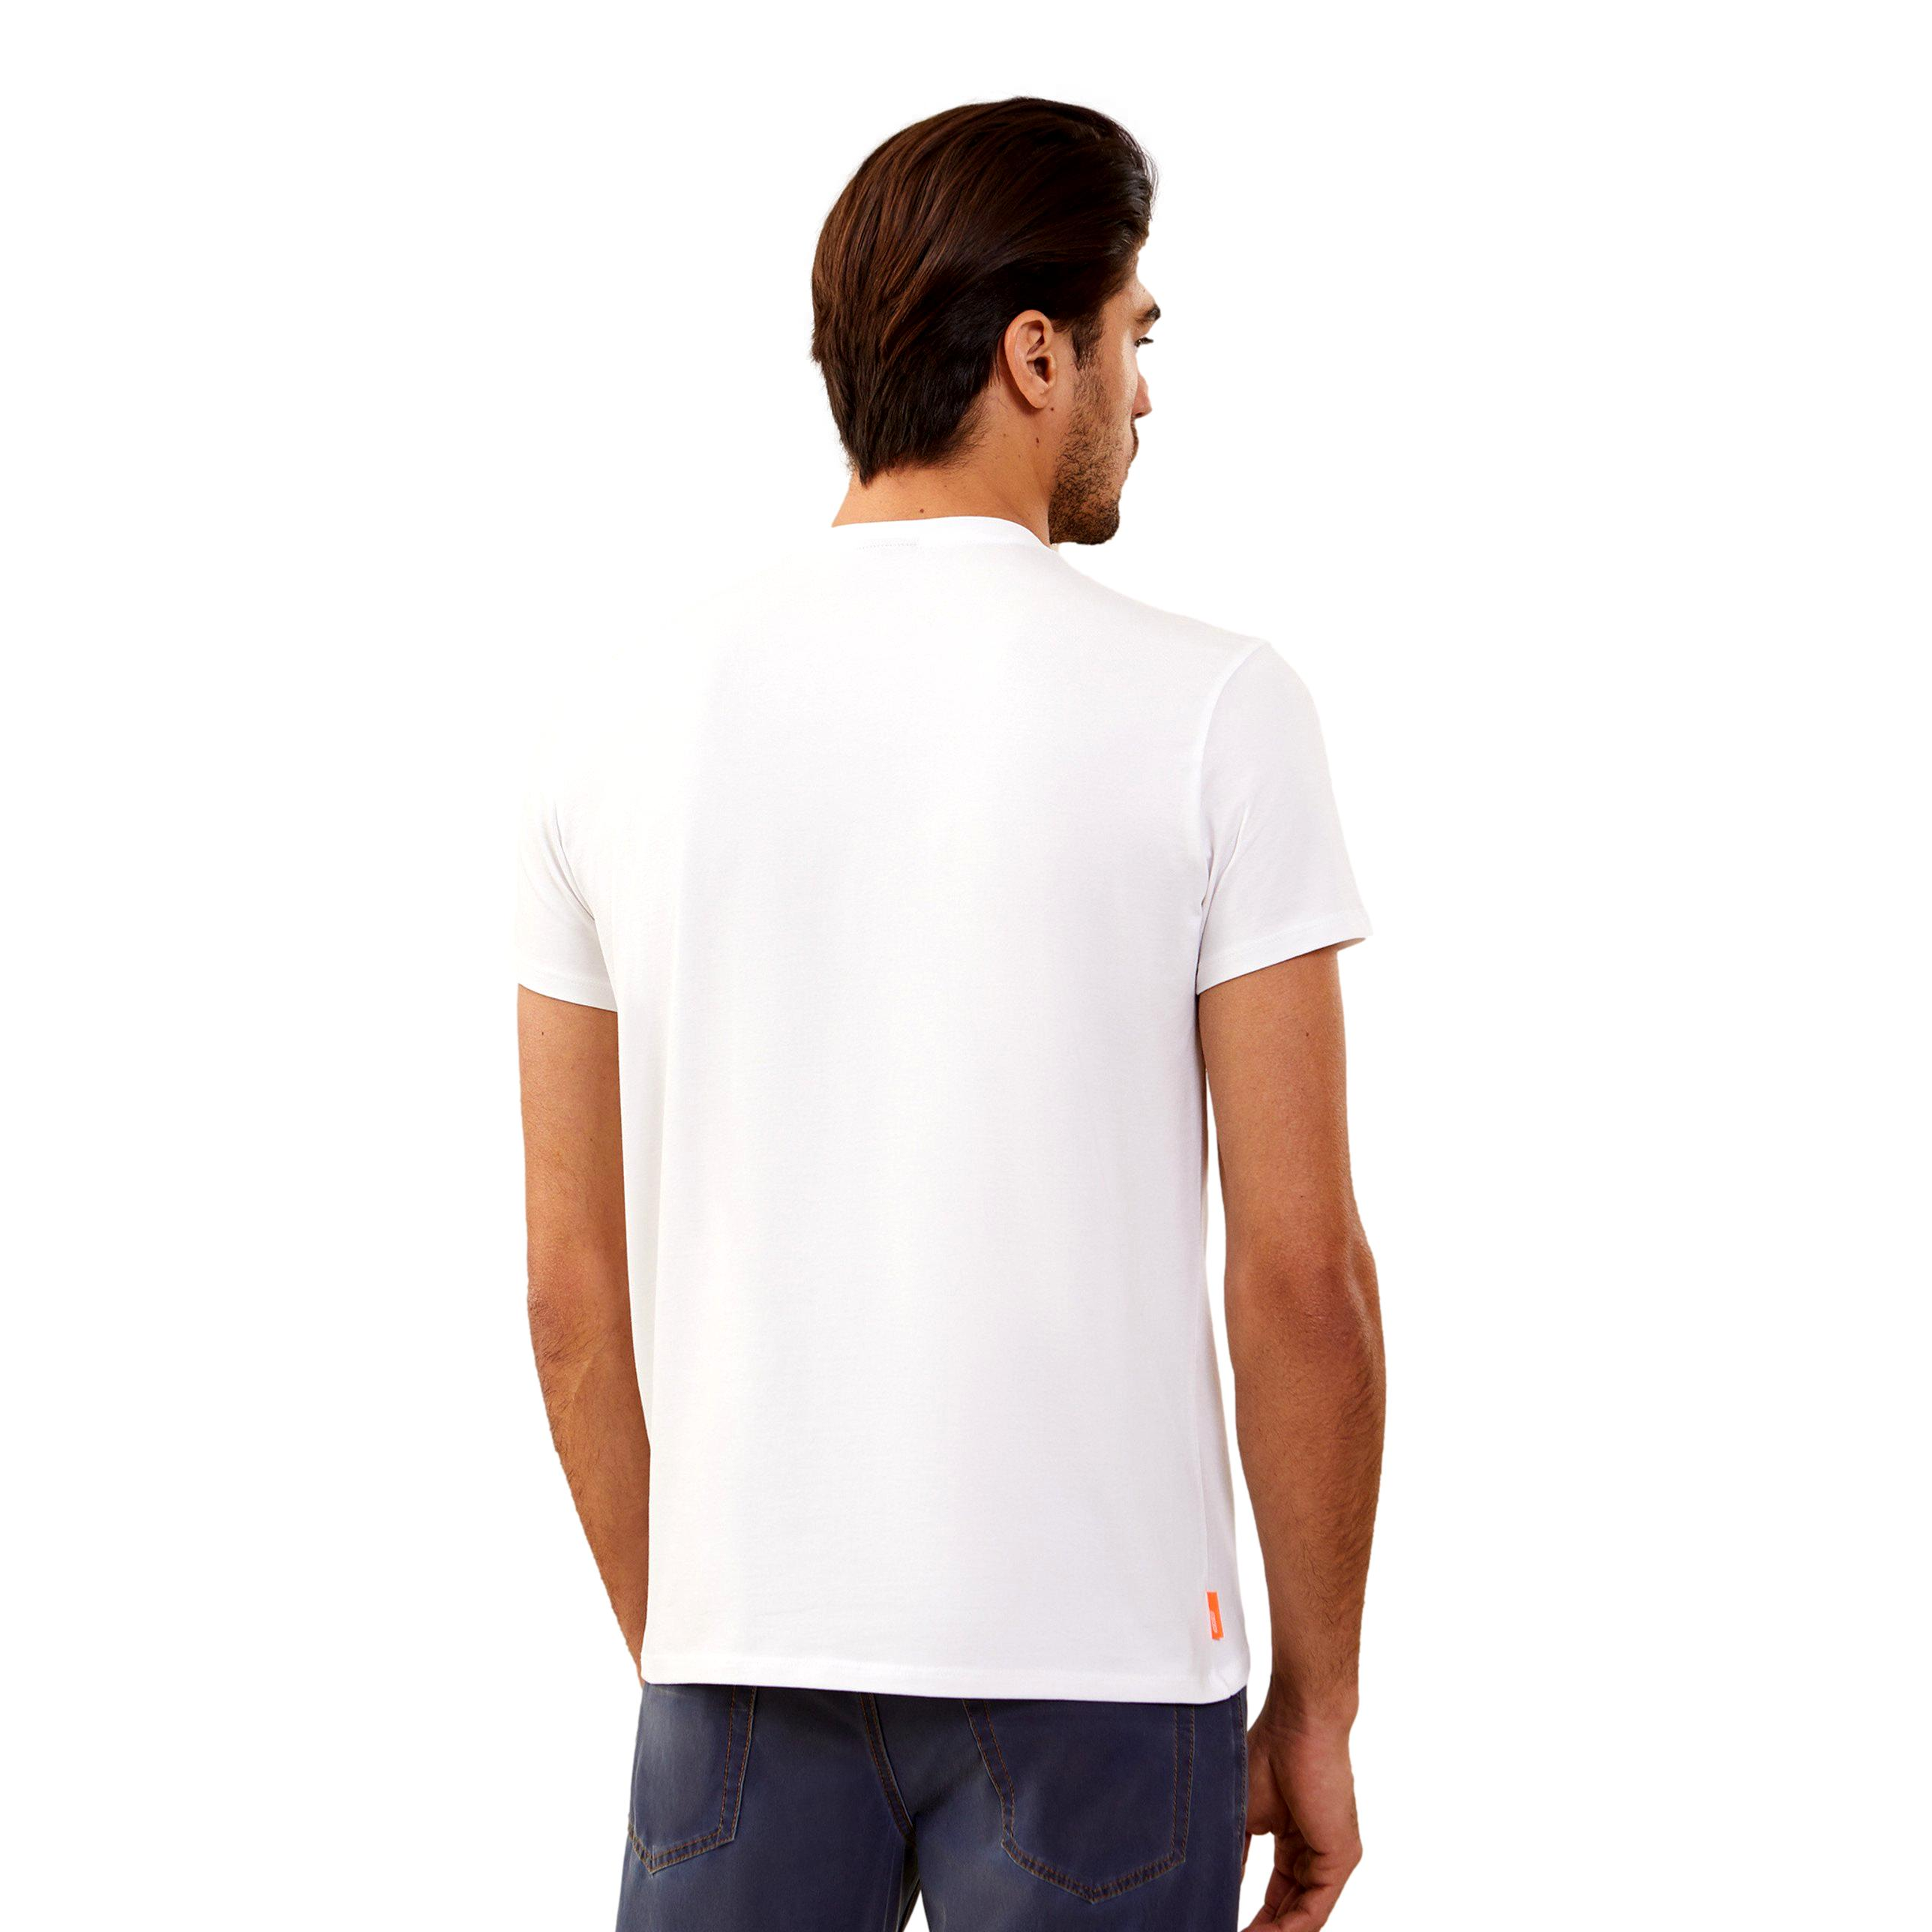 T-Shirt shirty revo RRD WHITE RRD |  | 2116309